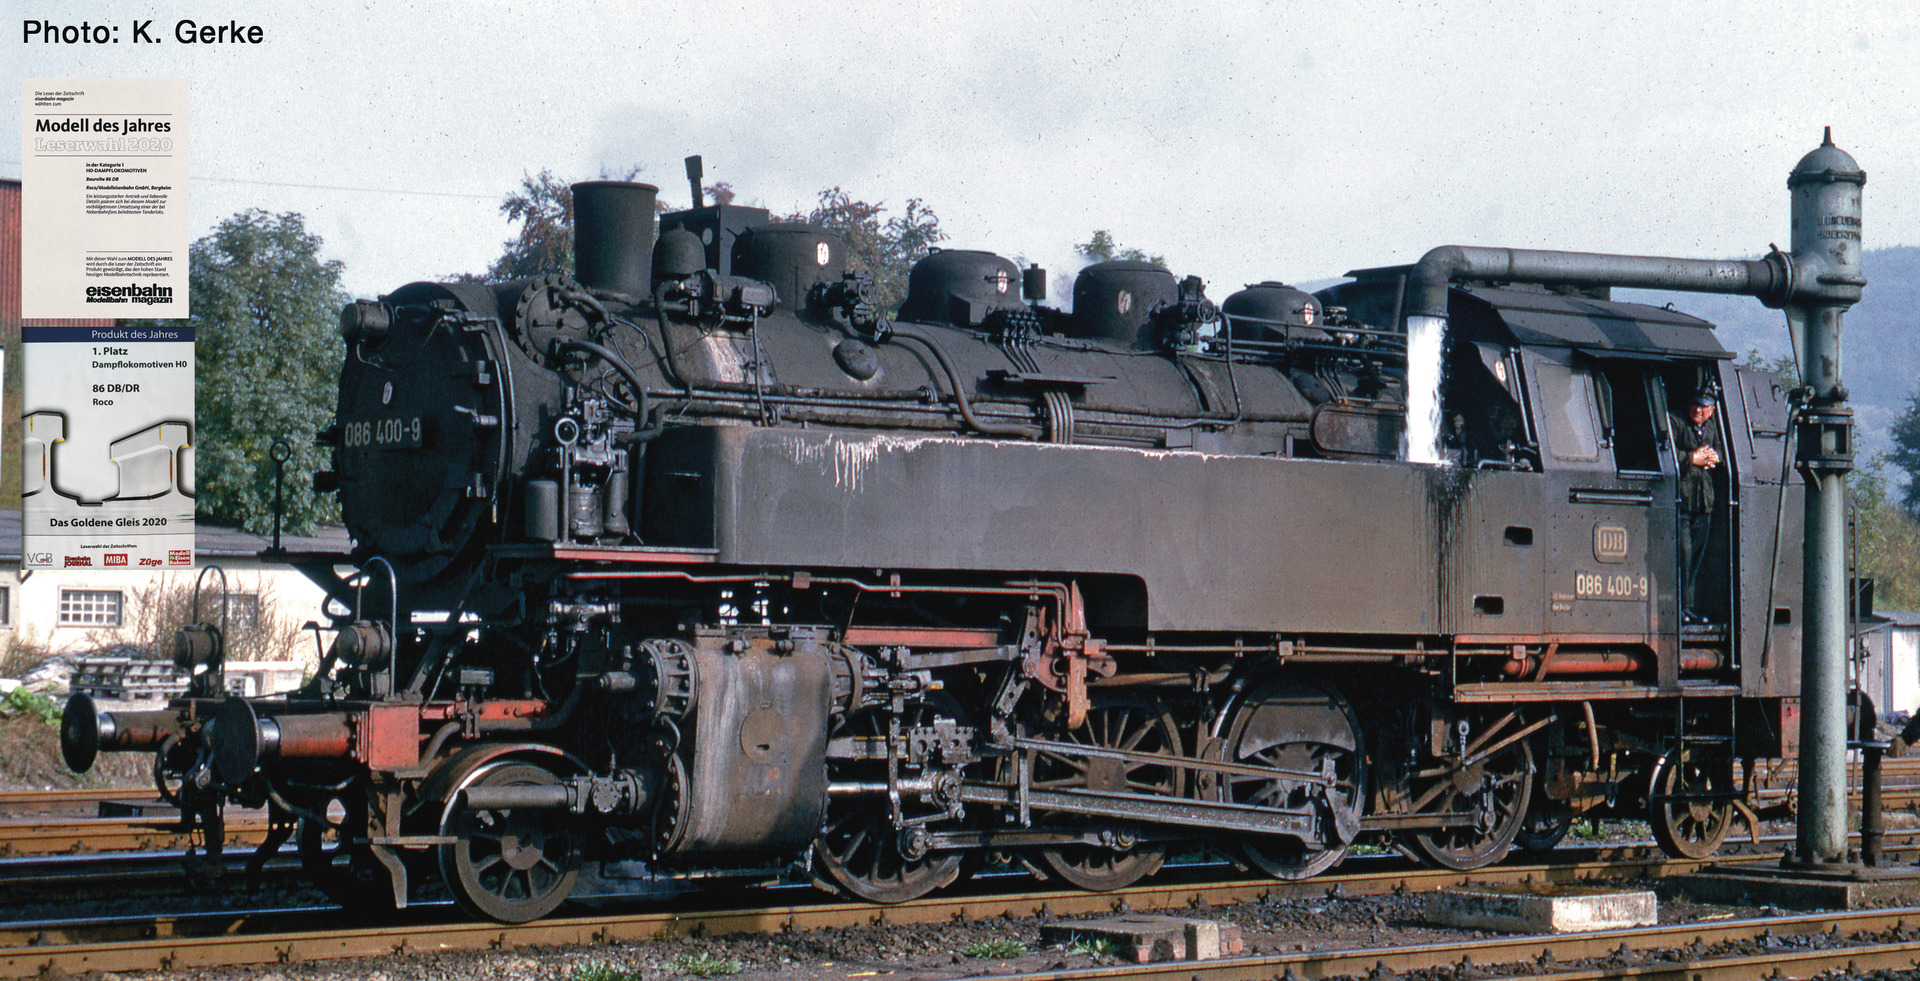 H0 Dampflok 086 400-9 der DB, Ep.IV